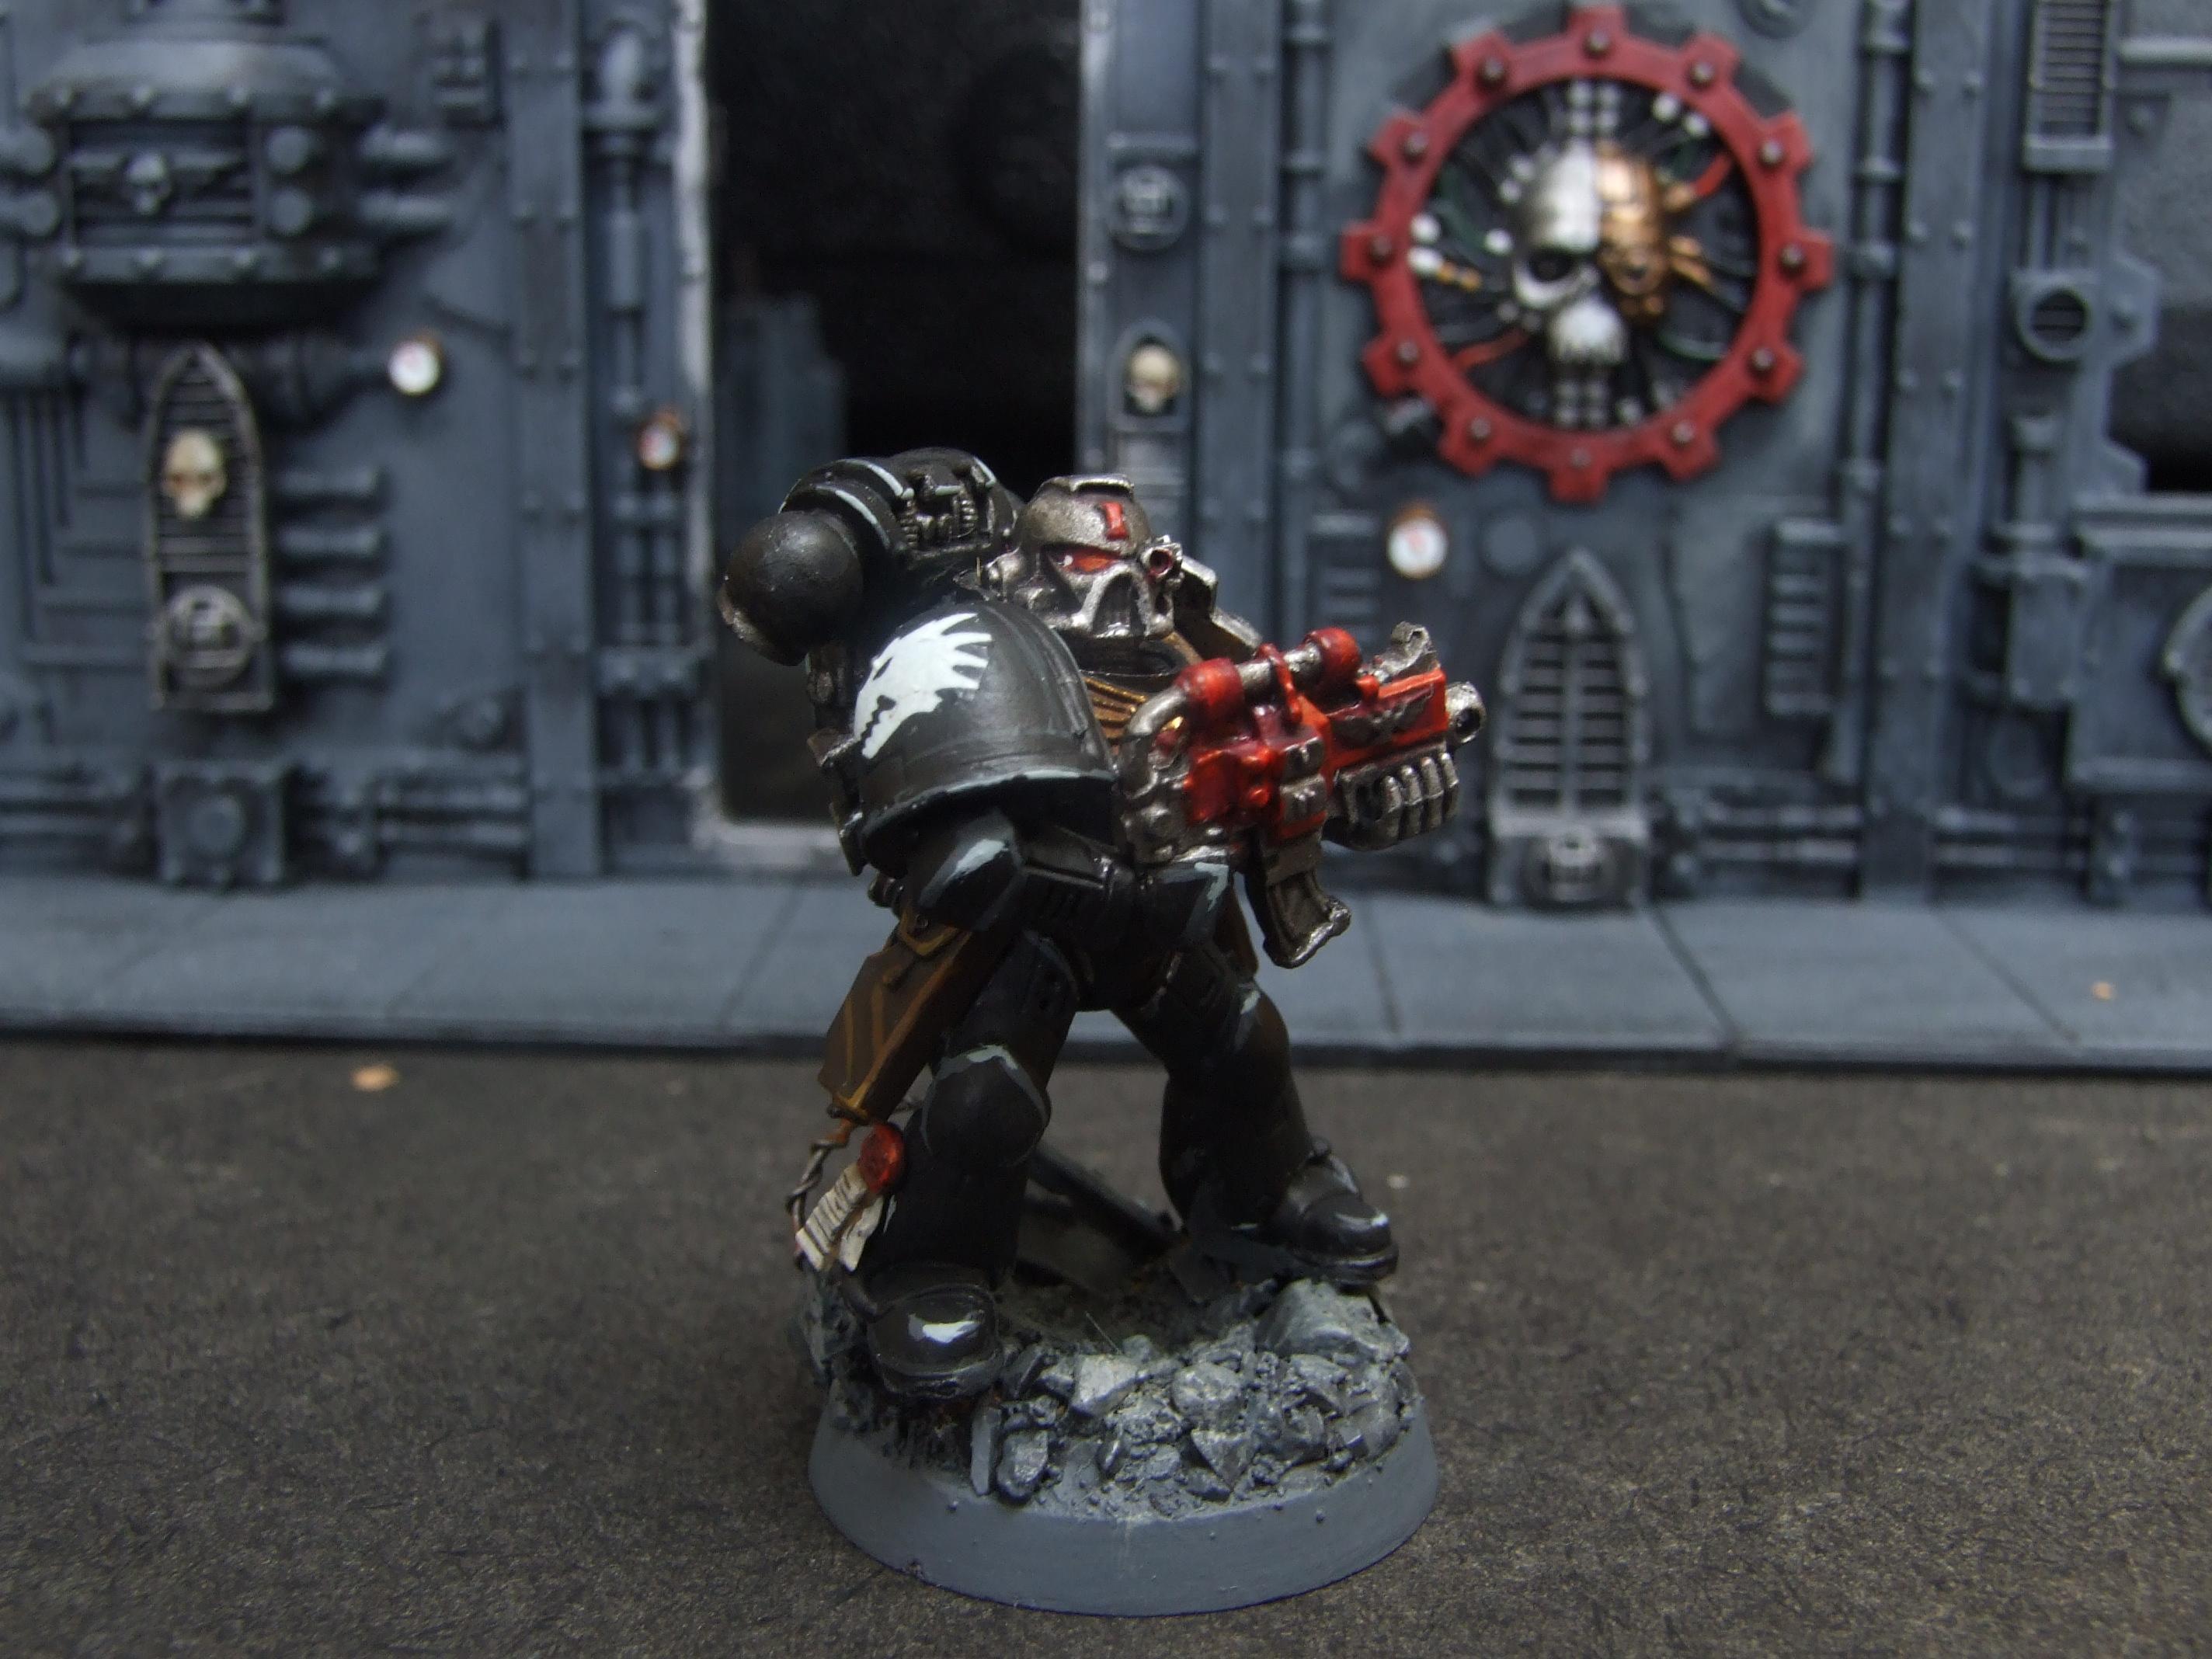 Death Watch, Imperial, Kill Team, Ordous Xenos, Slamander, Space Marines, Warhammer 40,000